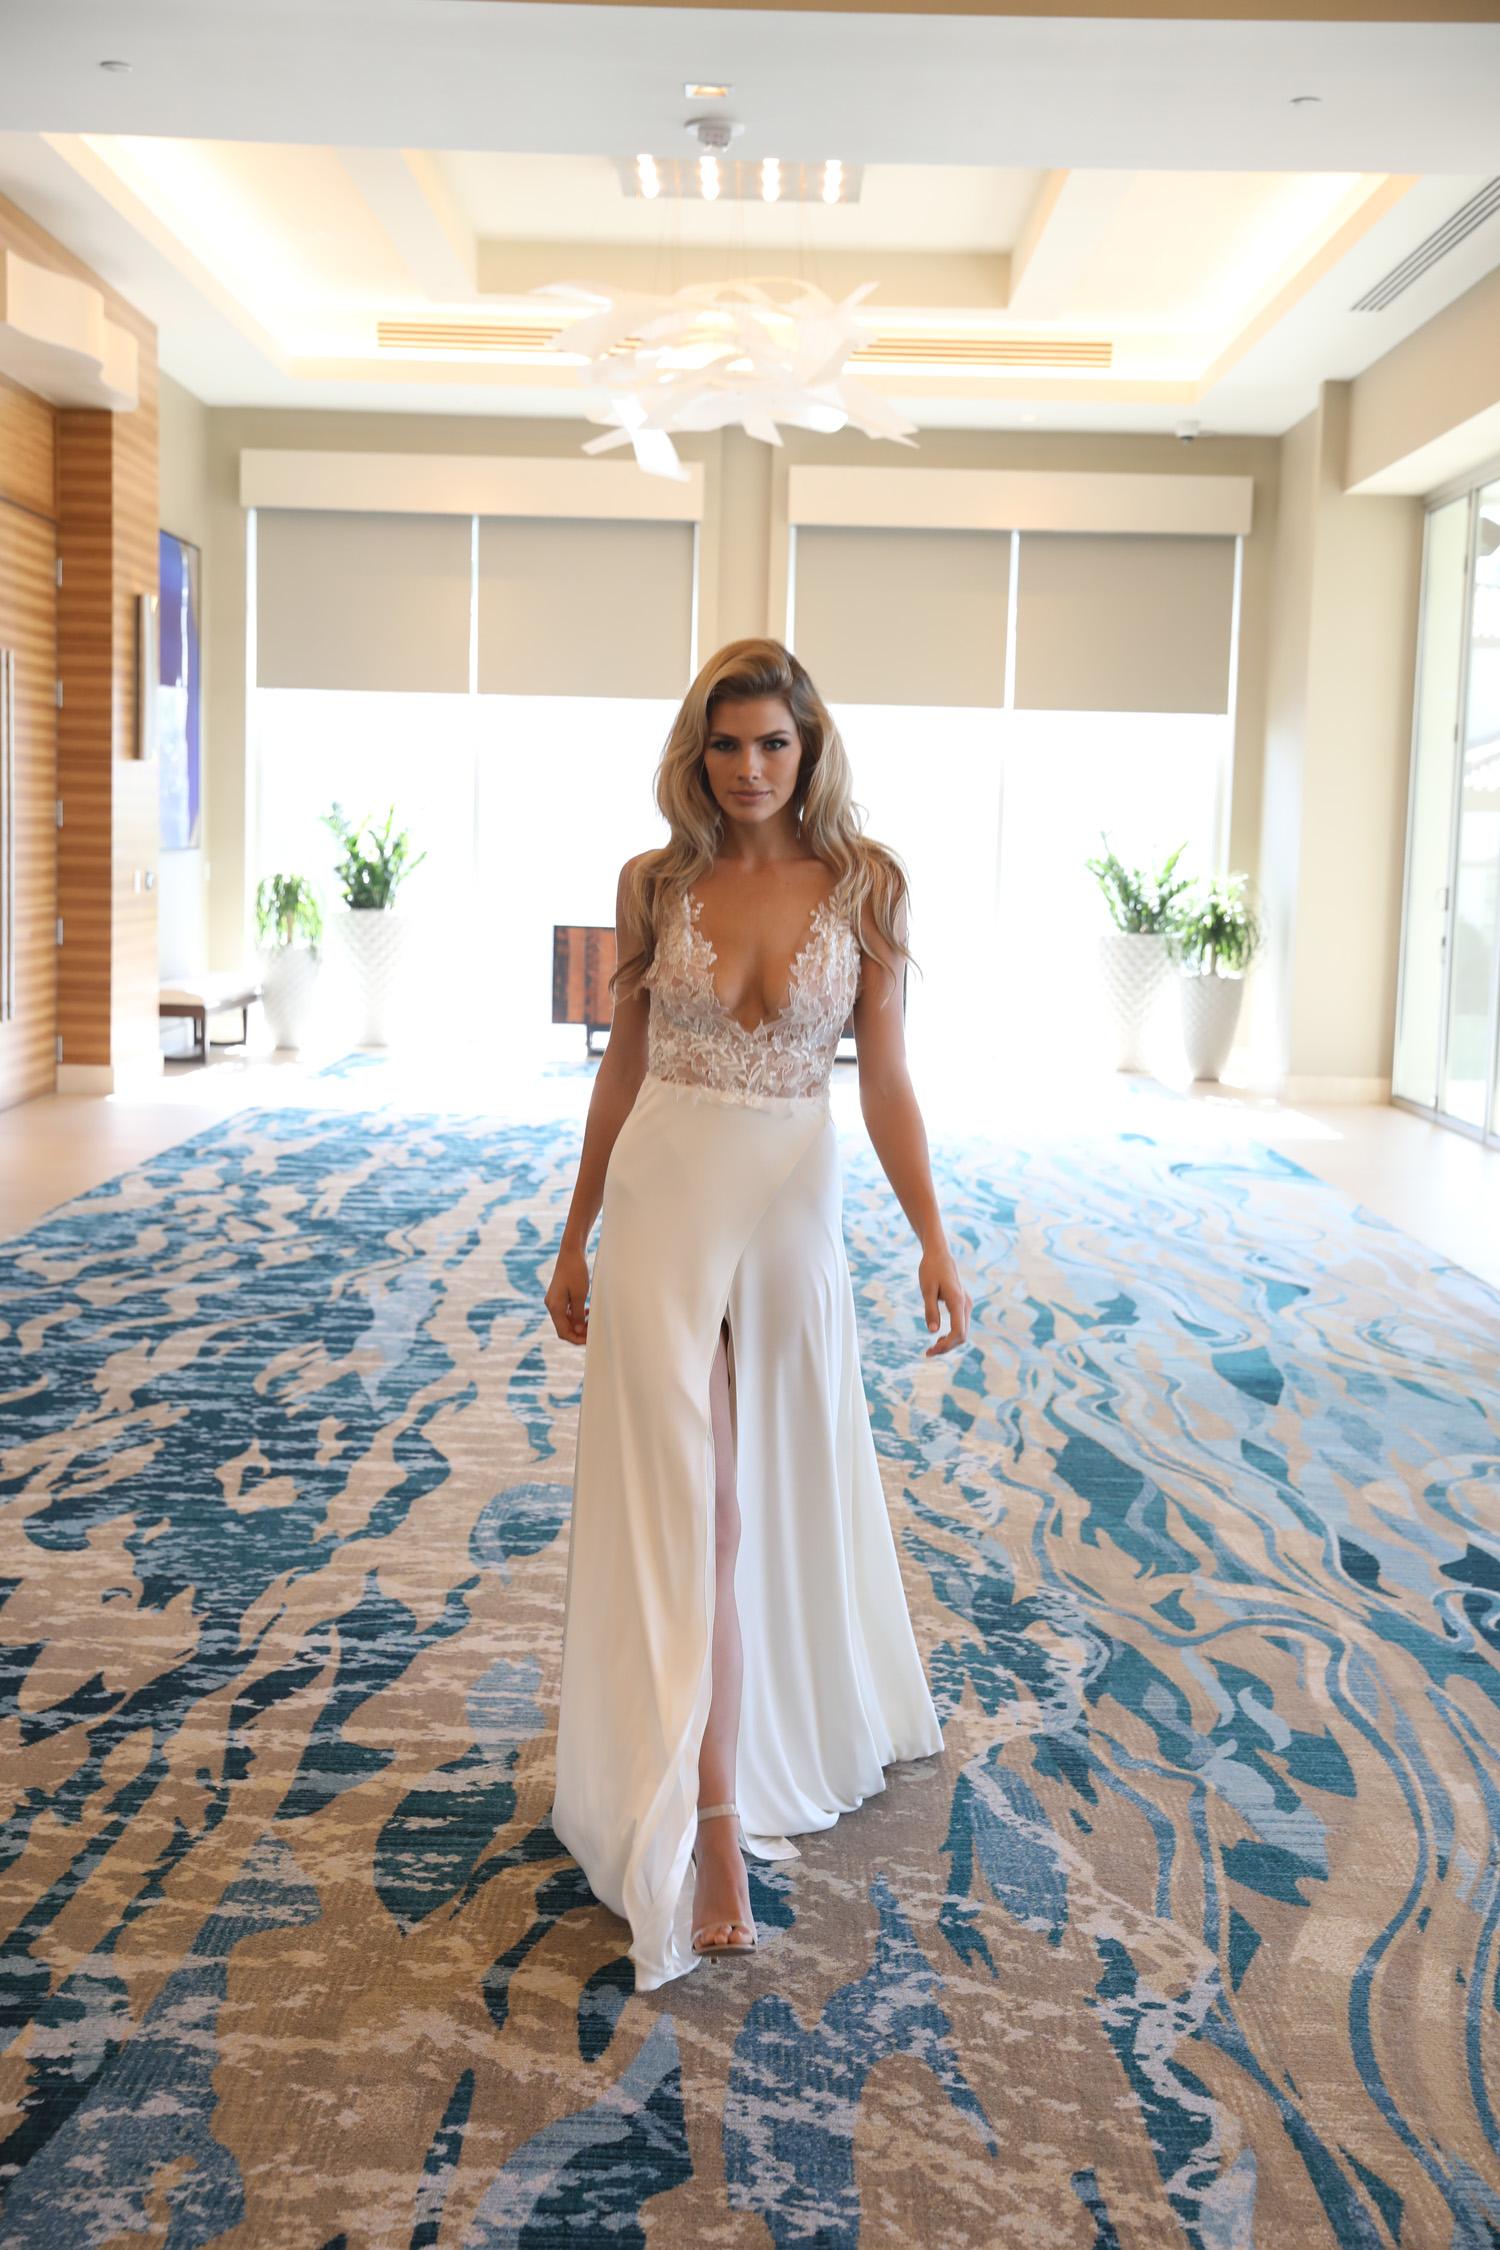 Erin Cole - Asia3 - Brautsalat